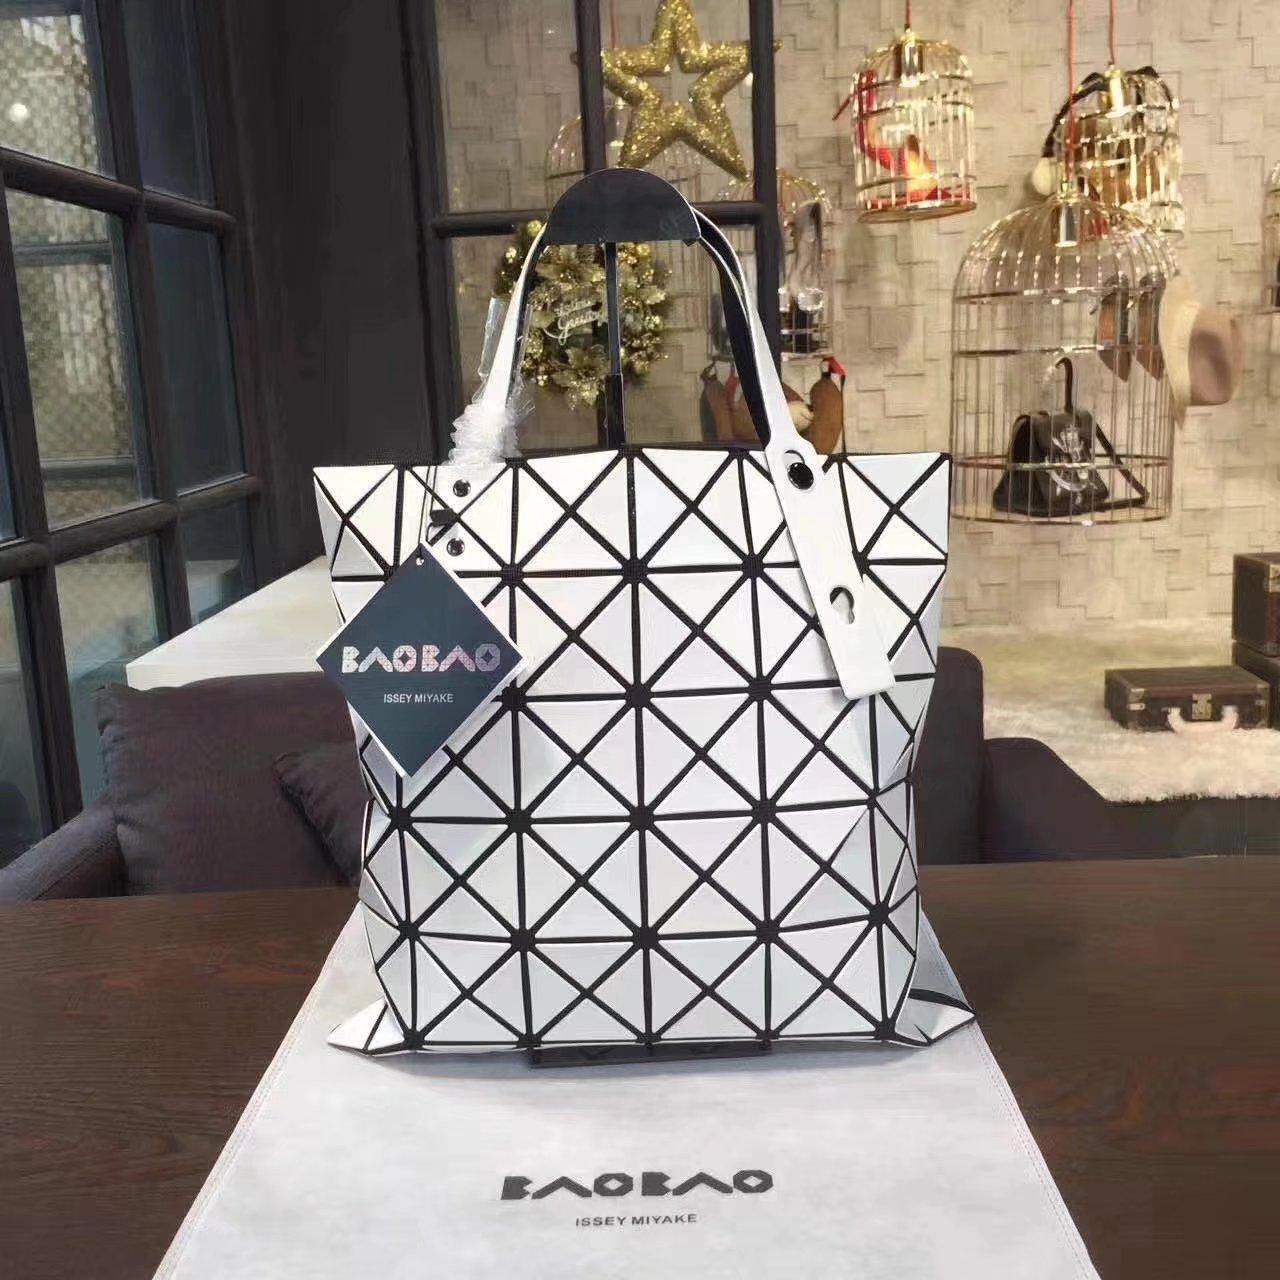 Issey Miyake Bao Bao Shopping Bag White